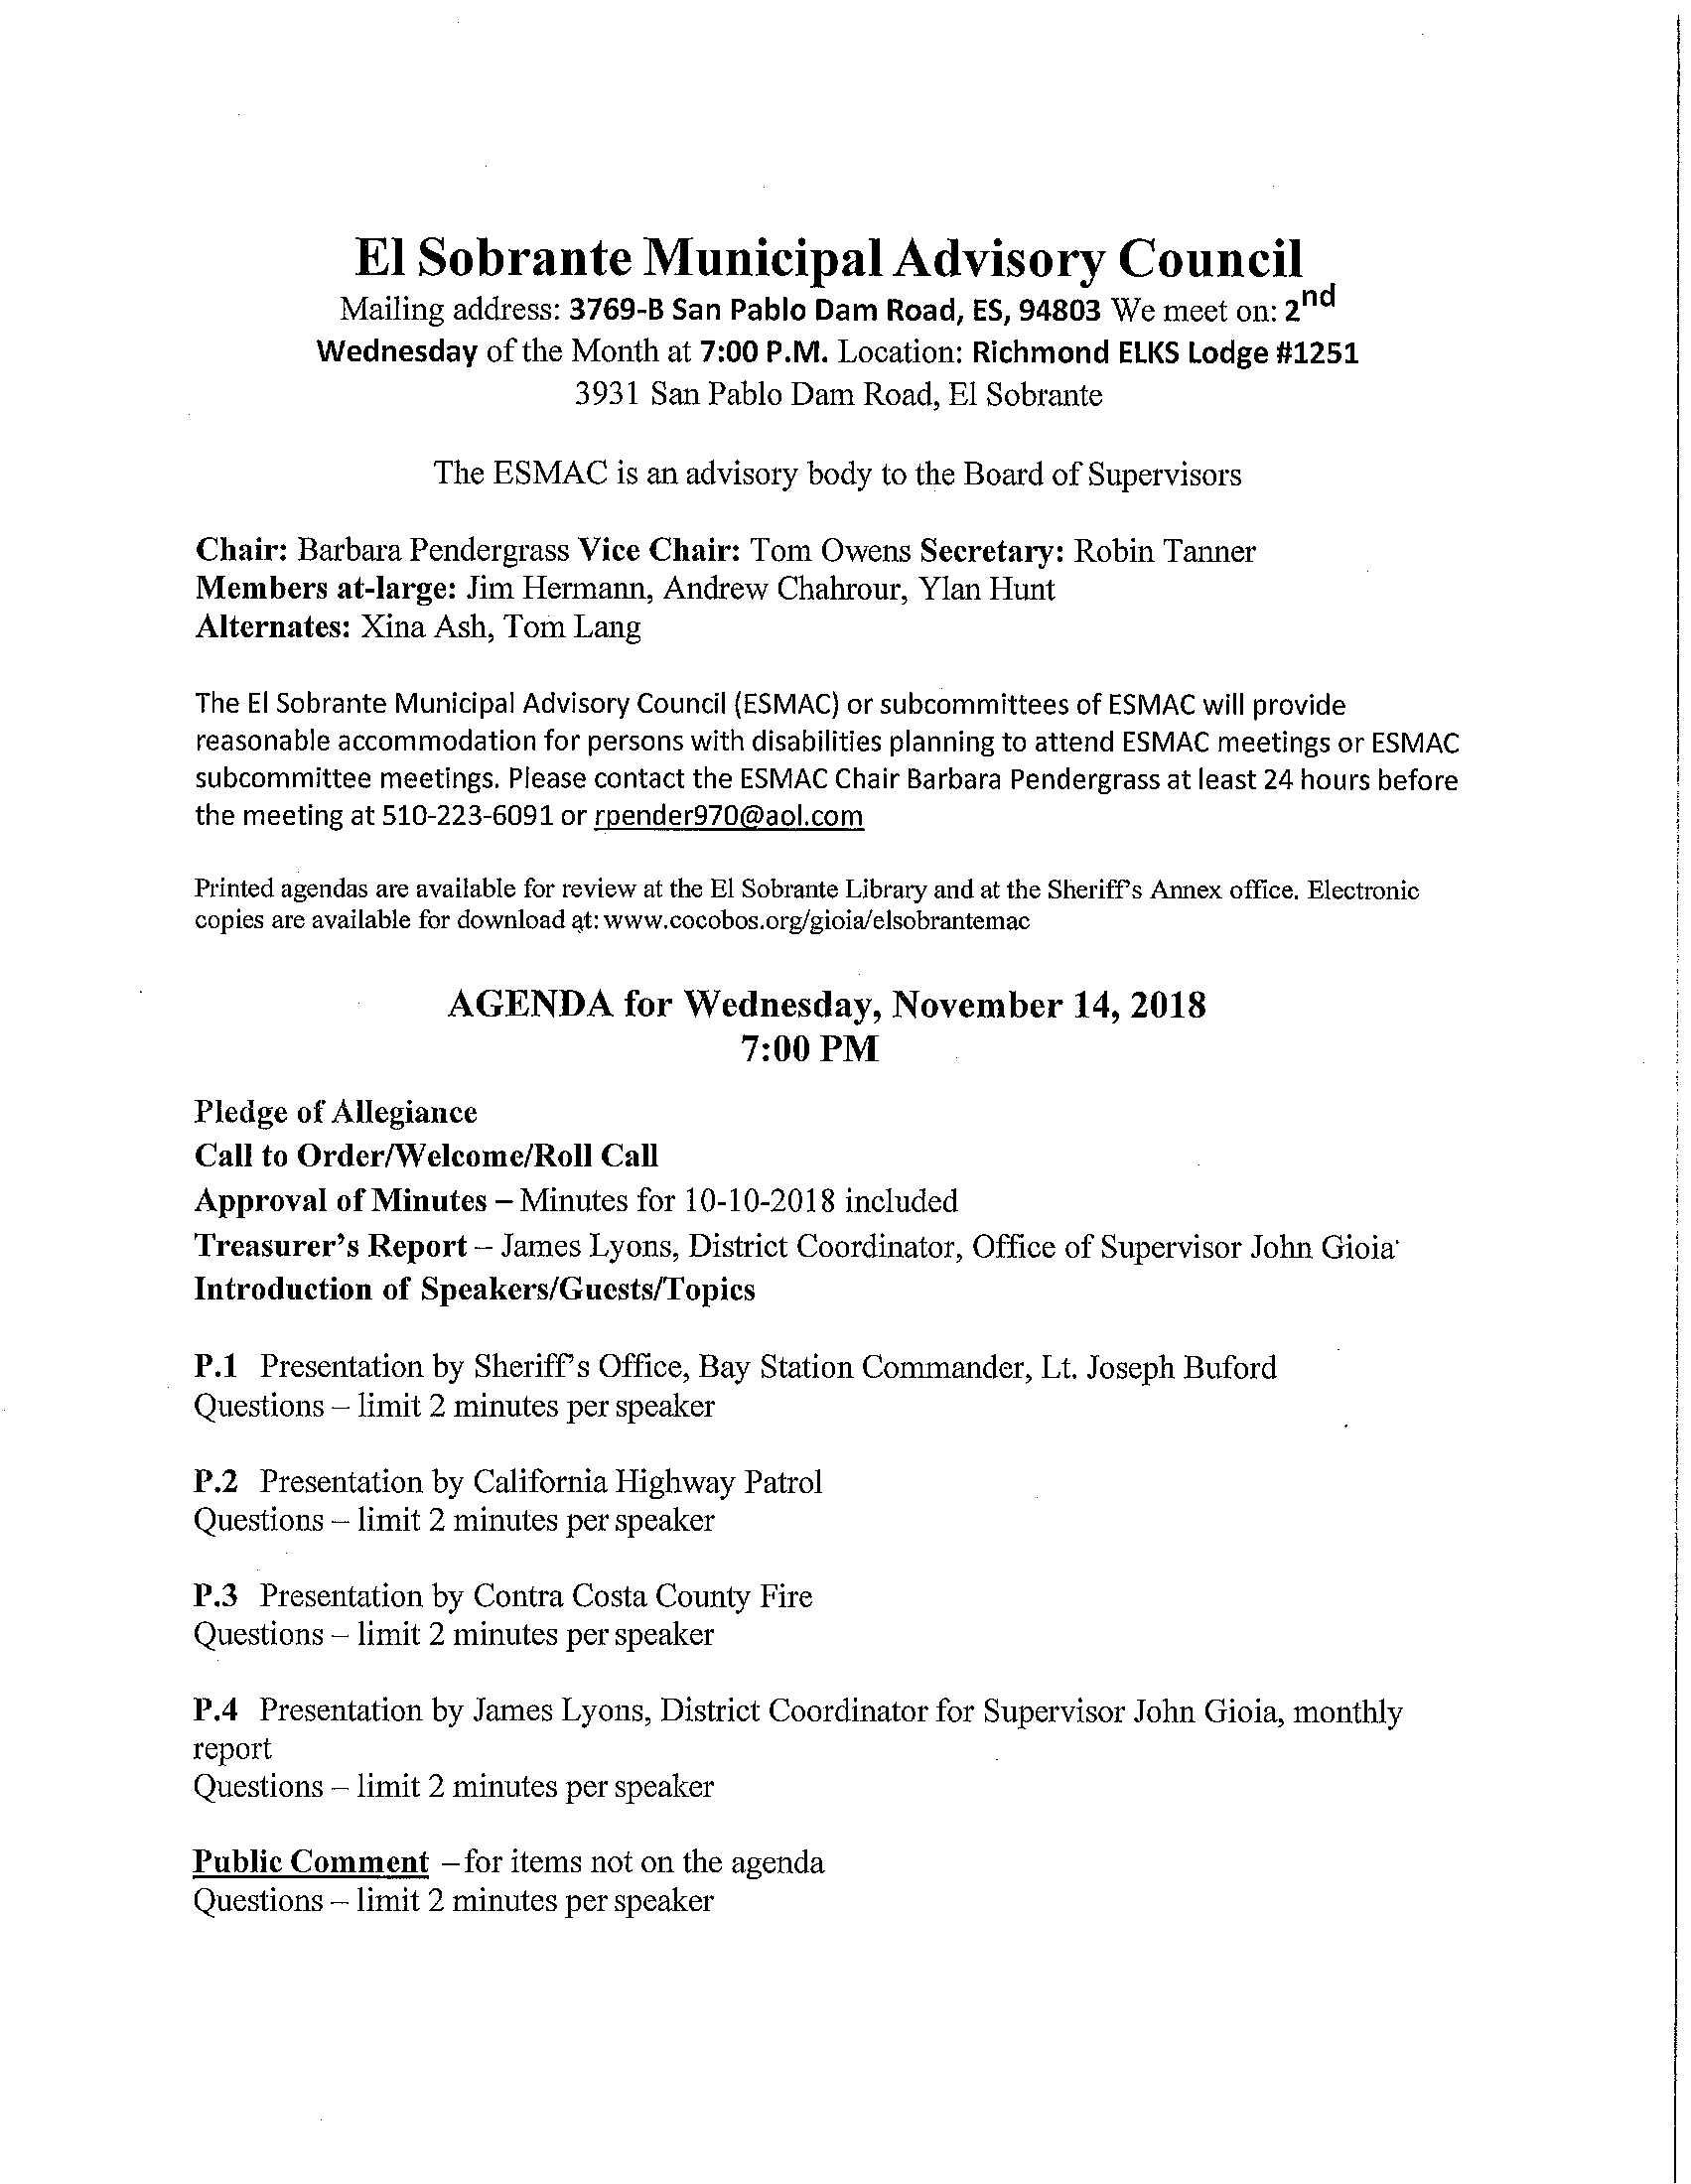 ESMAC Agenda 11.14.2018 (46 Pages)_1.jpg